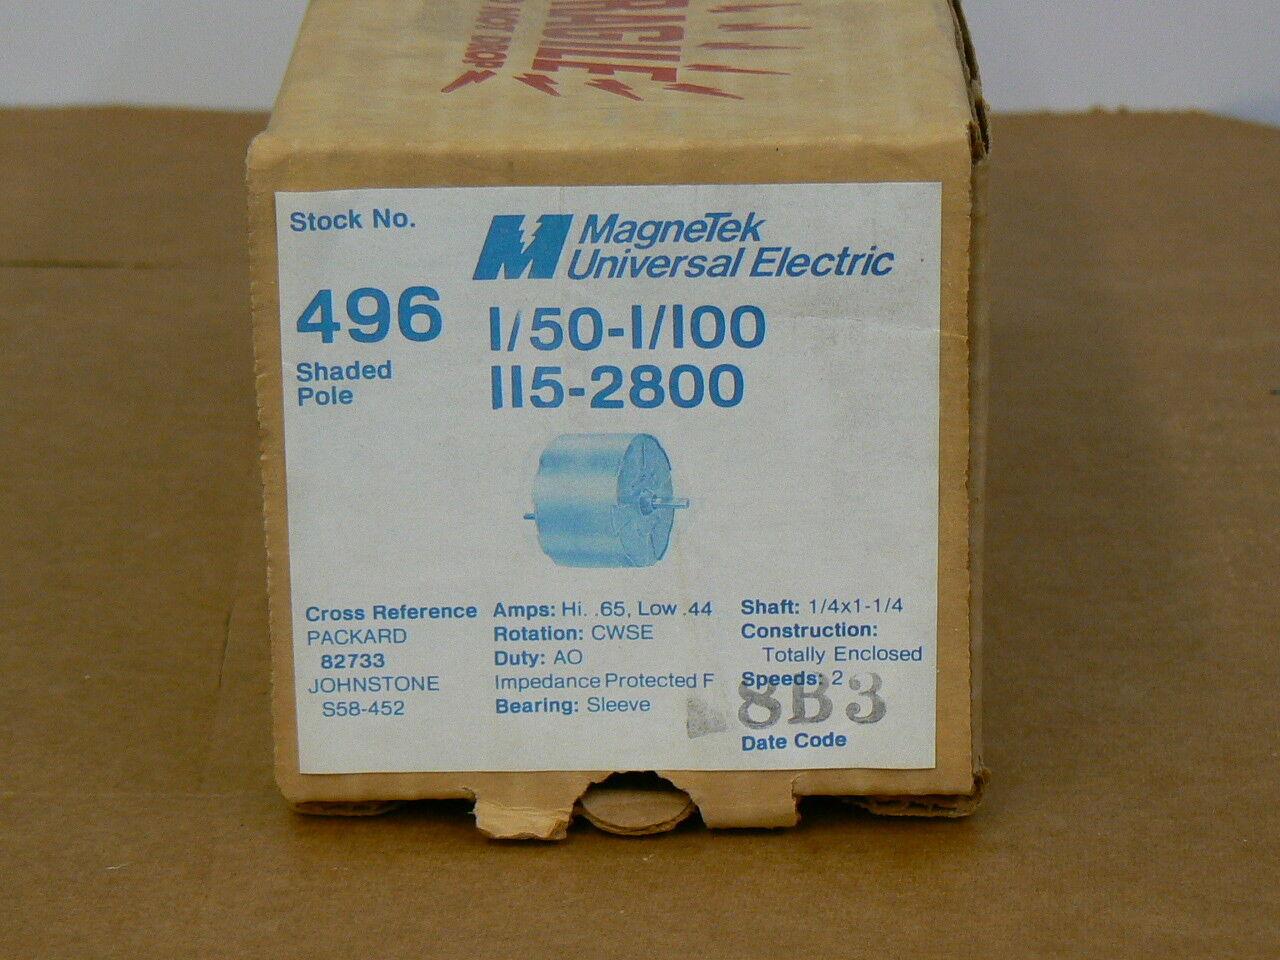 579 Magnetek Mkotor 1//50 HP Model JA1M147N FREE SHIPPING